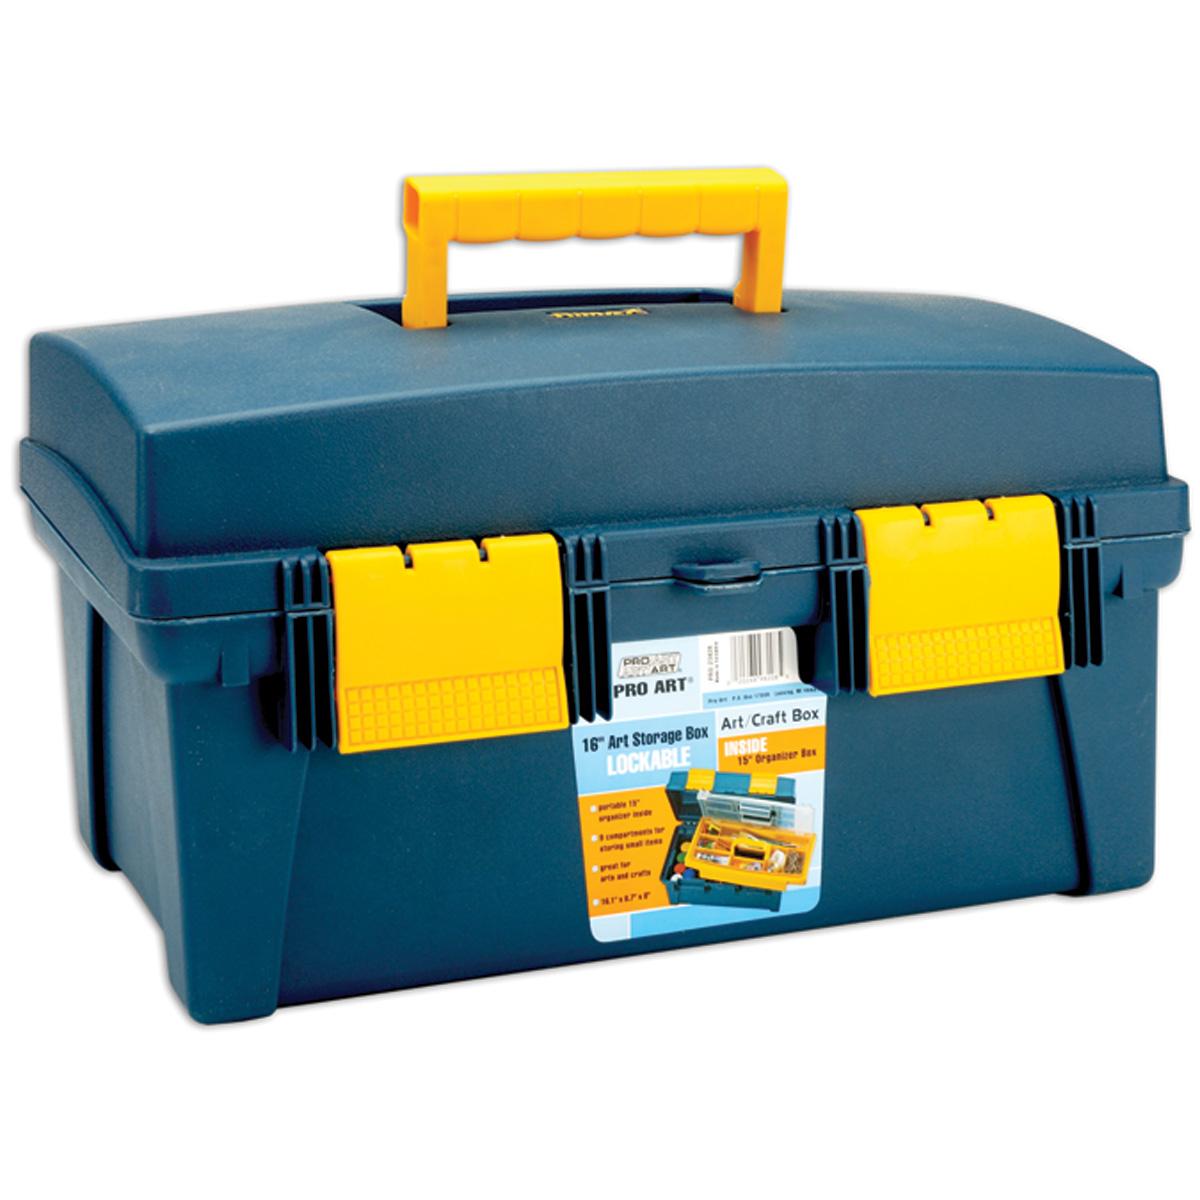 "Pro Art Storage Box With Inner Tray 16""x8.9""x8.6"", Blue/Yellow"